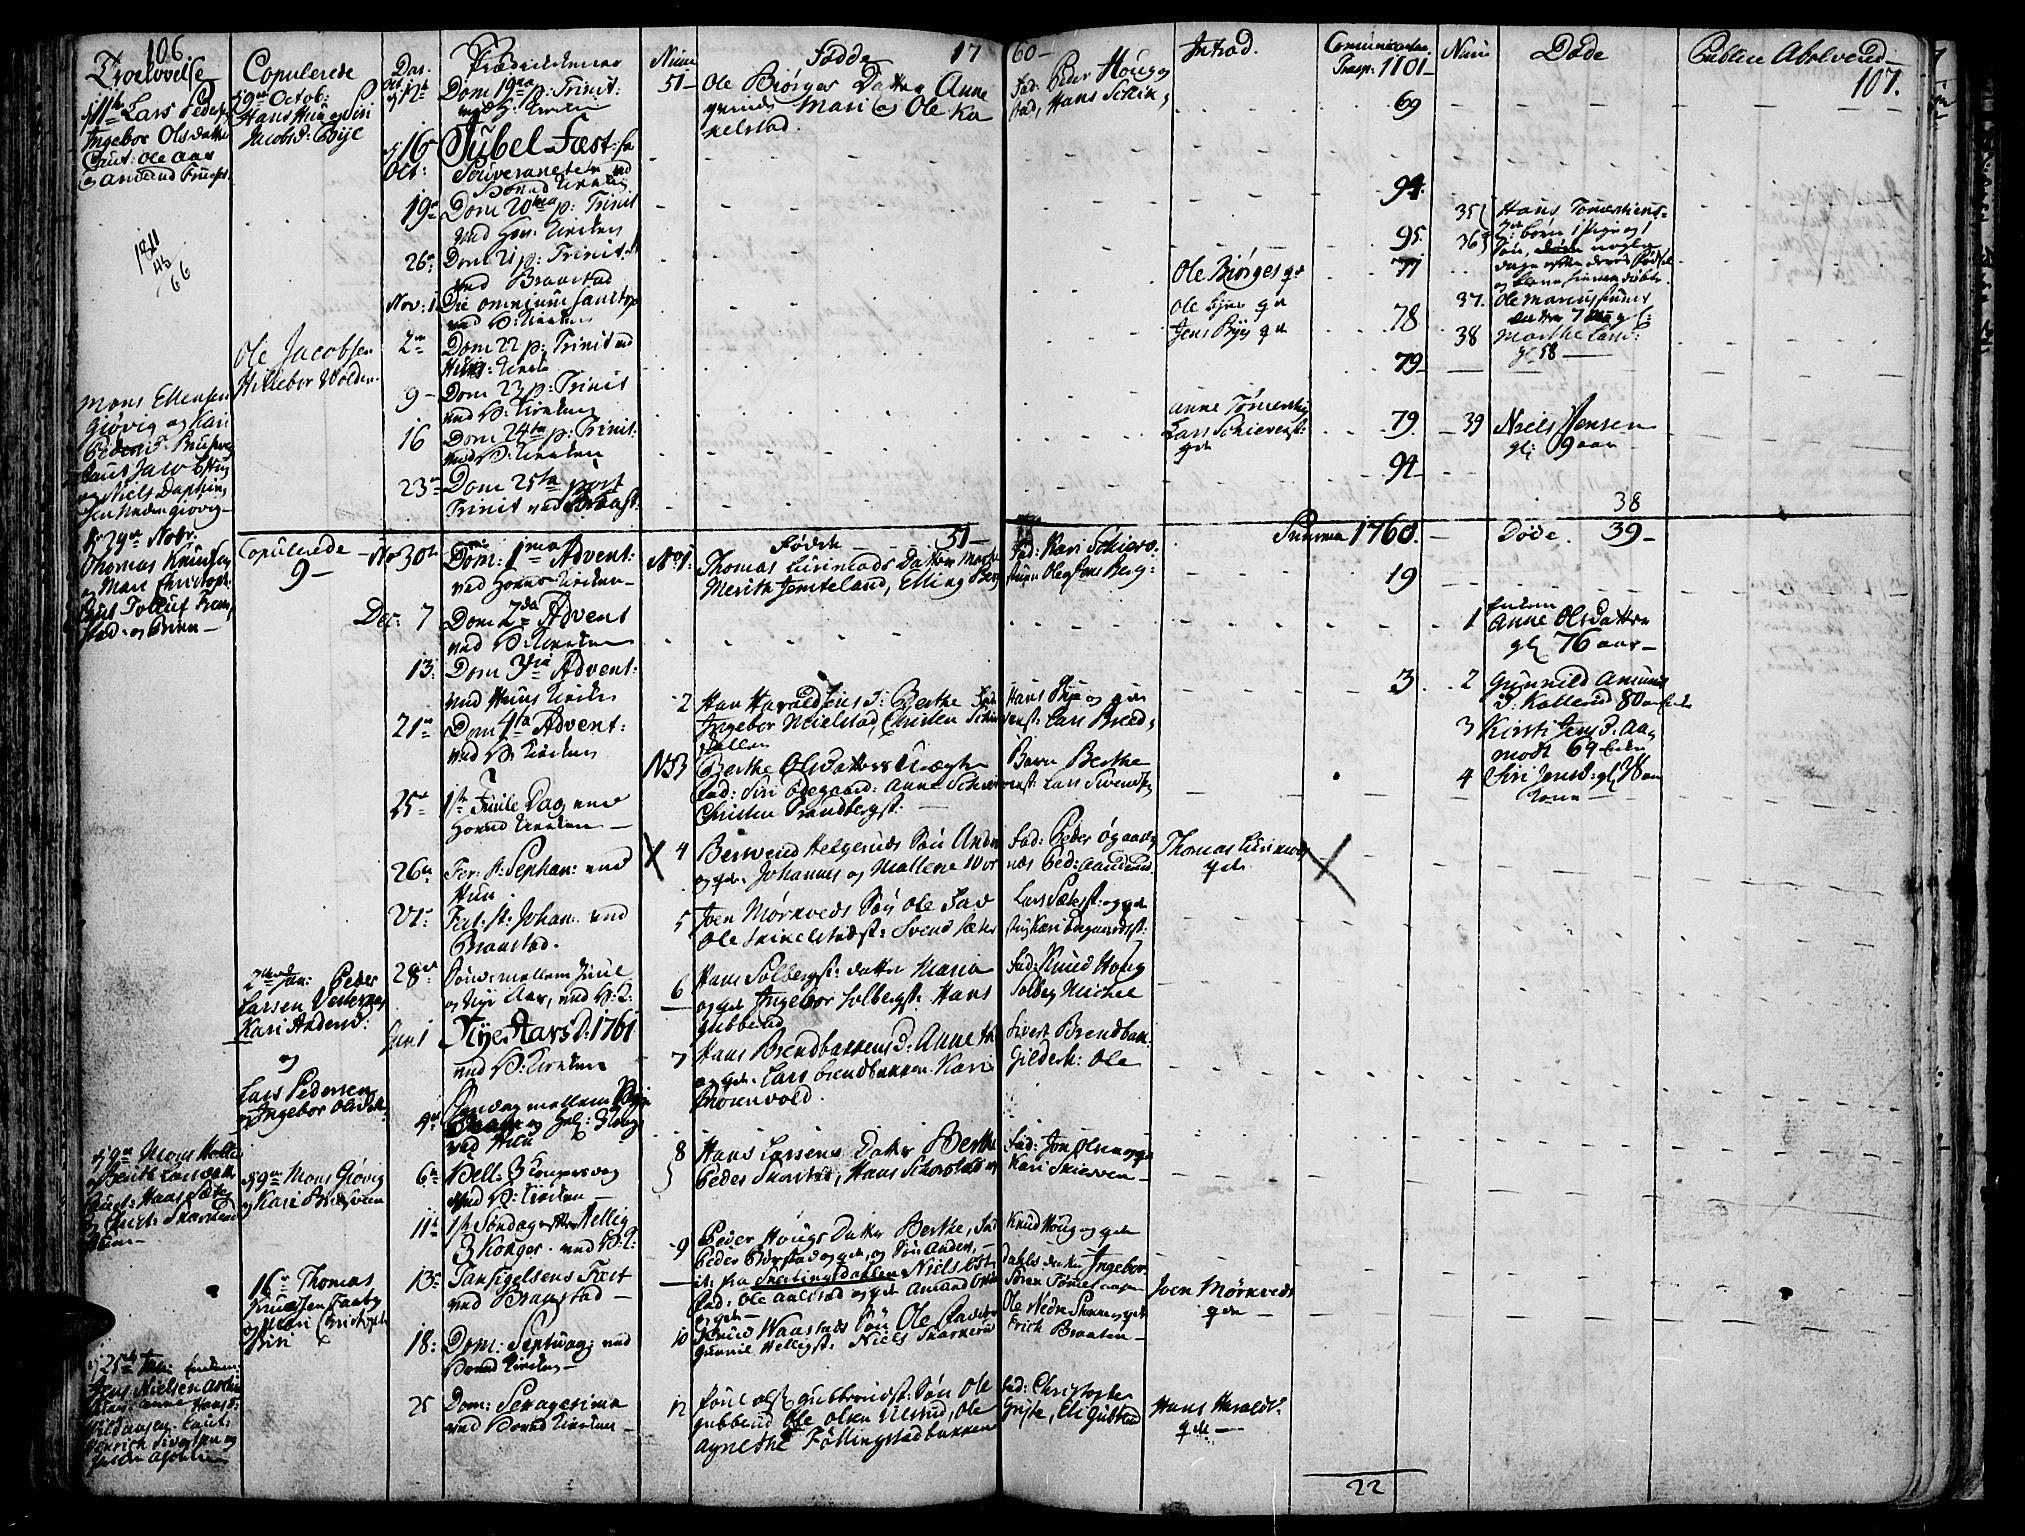 SAH, Vardal prestekontor, H/Ha/Haa/L0002: Ministerialbok nr. 2, 1748-1776, s. 106-107